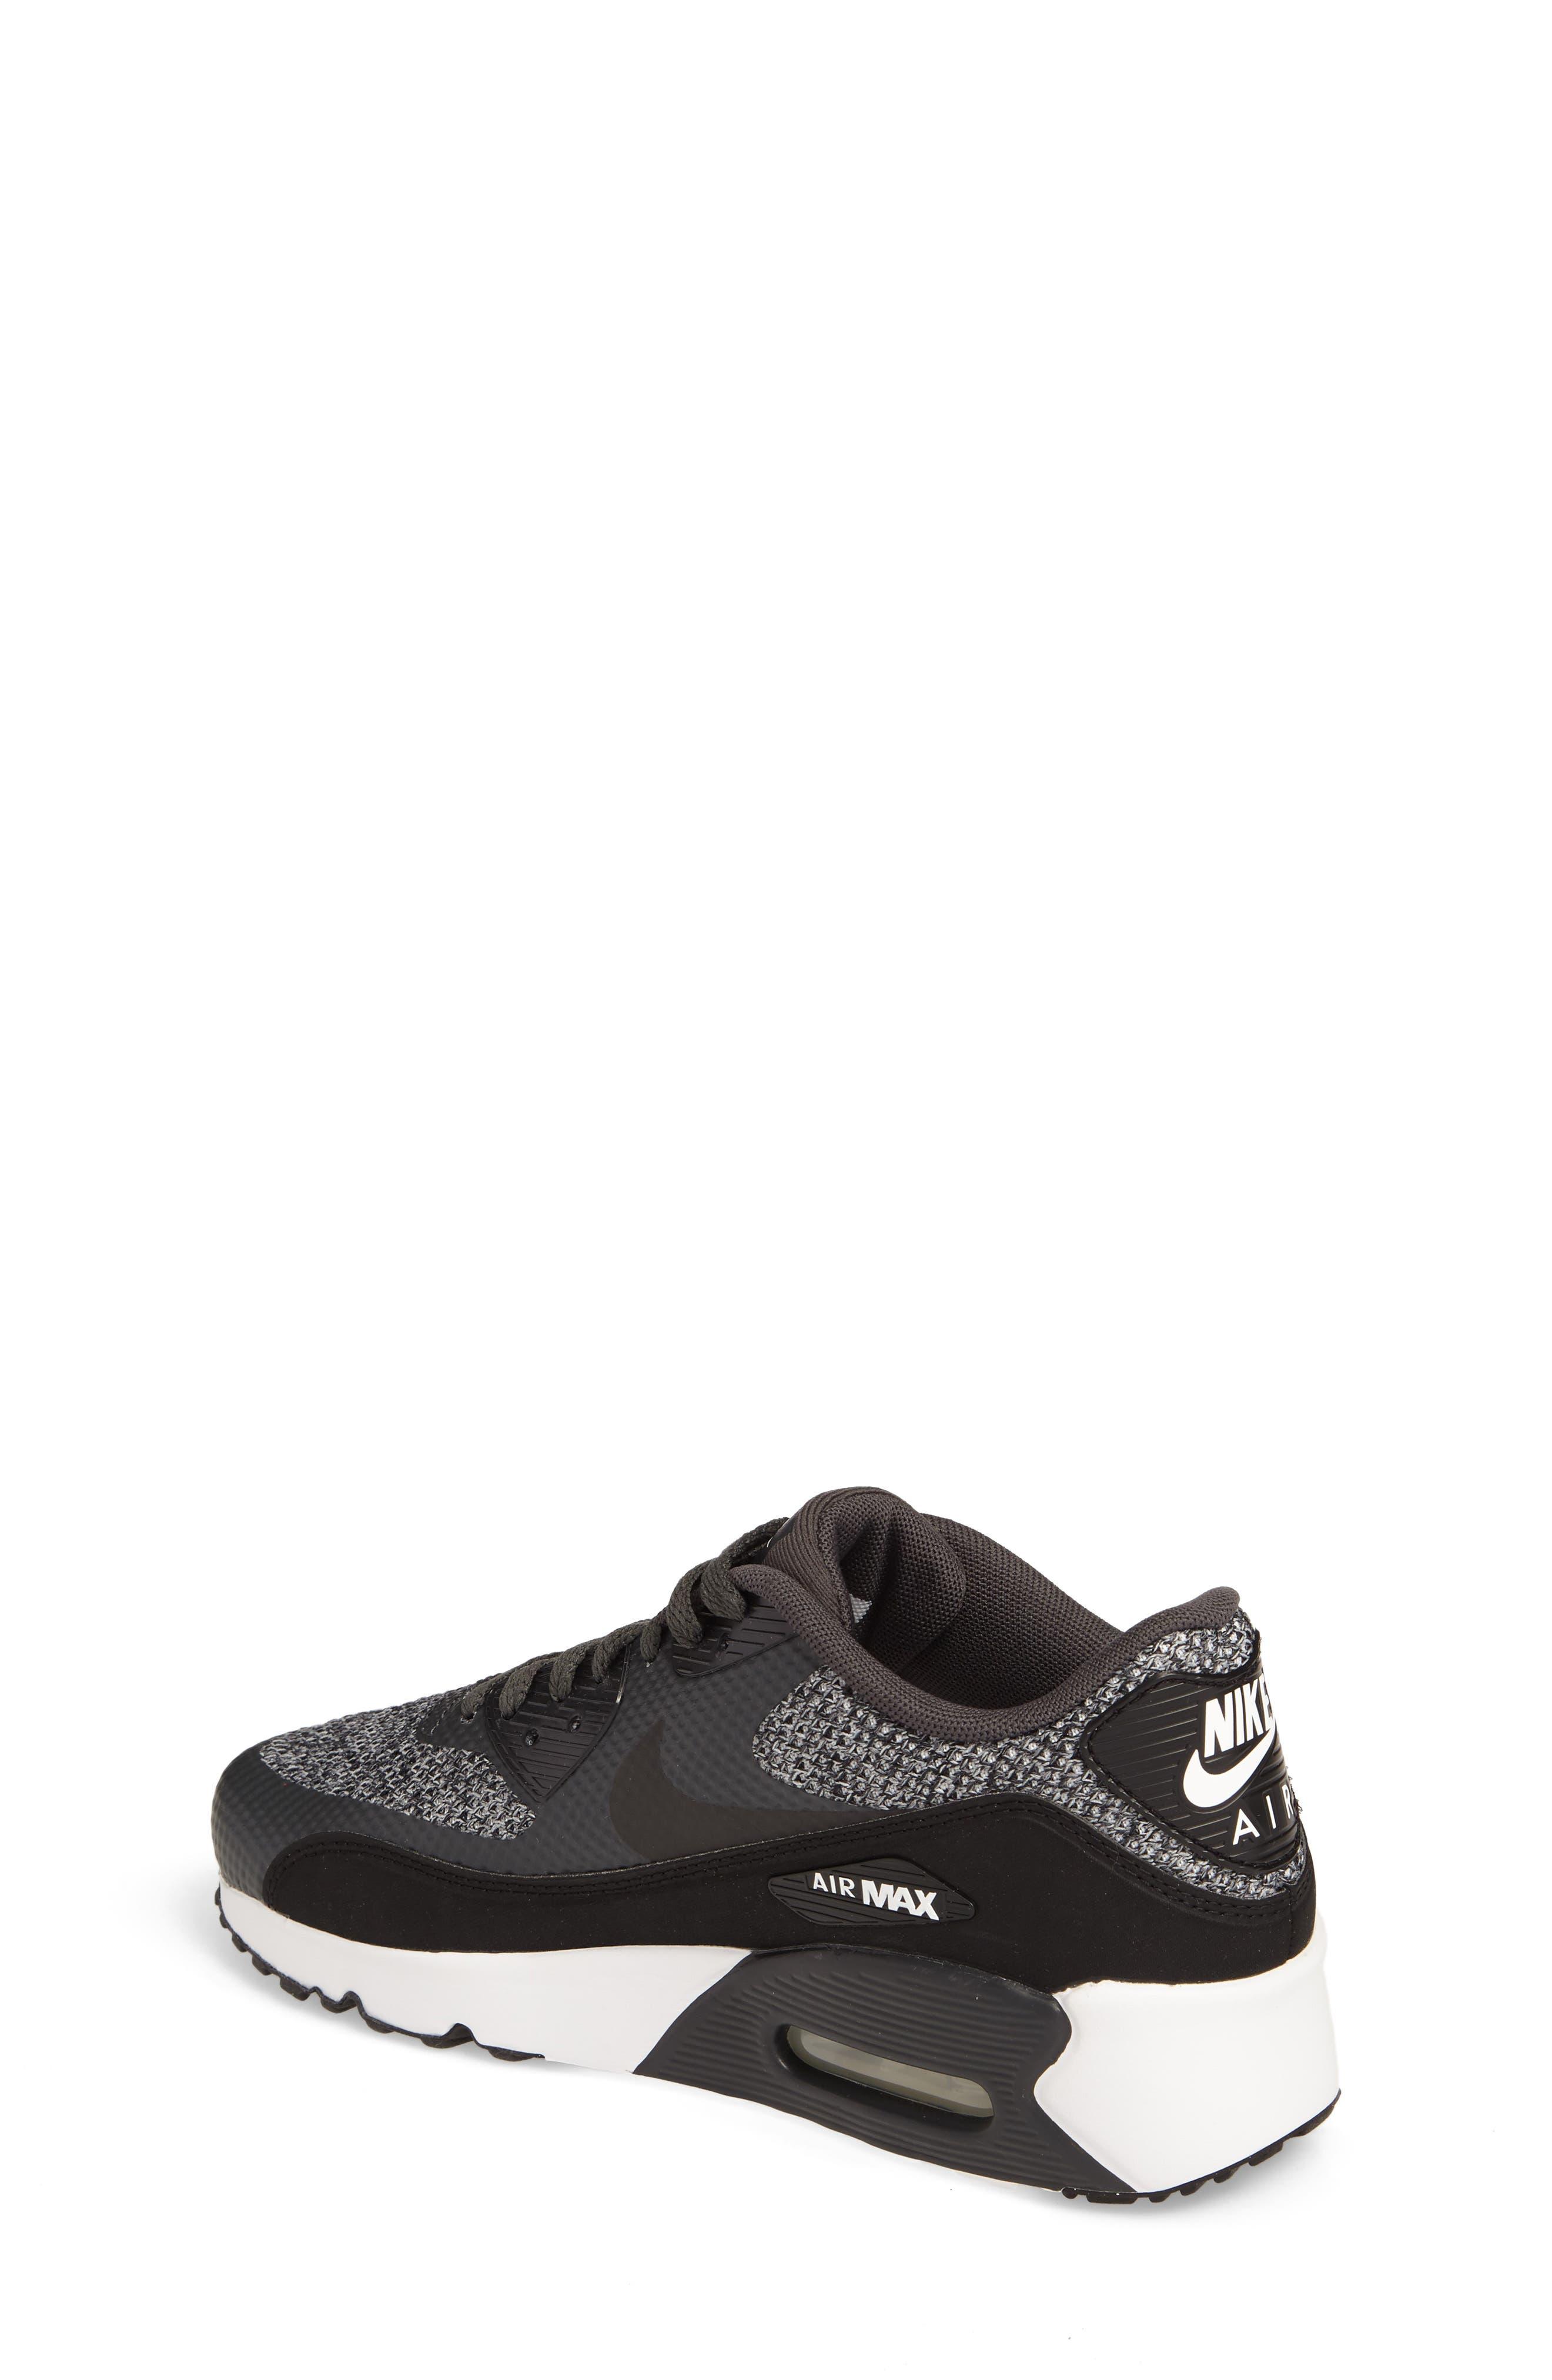 Air Max 90 Ultra 2.0 SE Sneaker,                             Alternate thumbnail 2, color,                             Anthracite/ Black